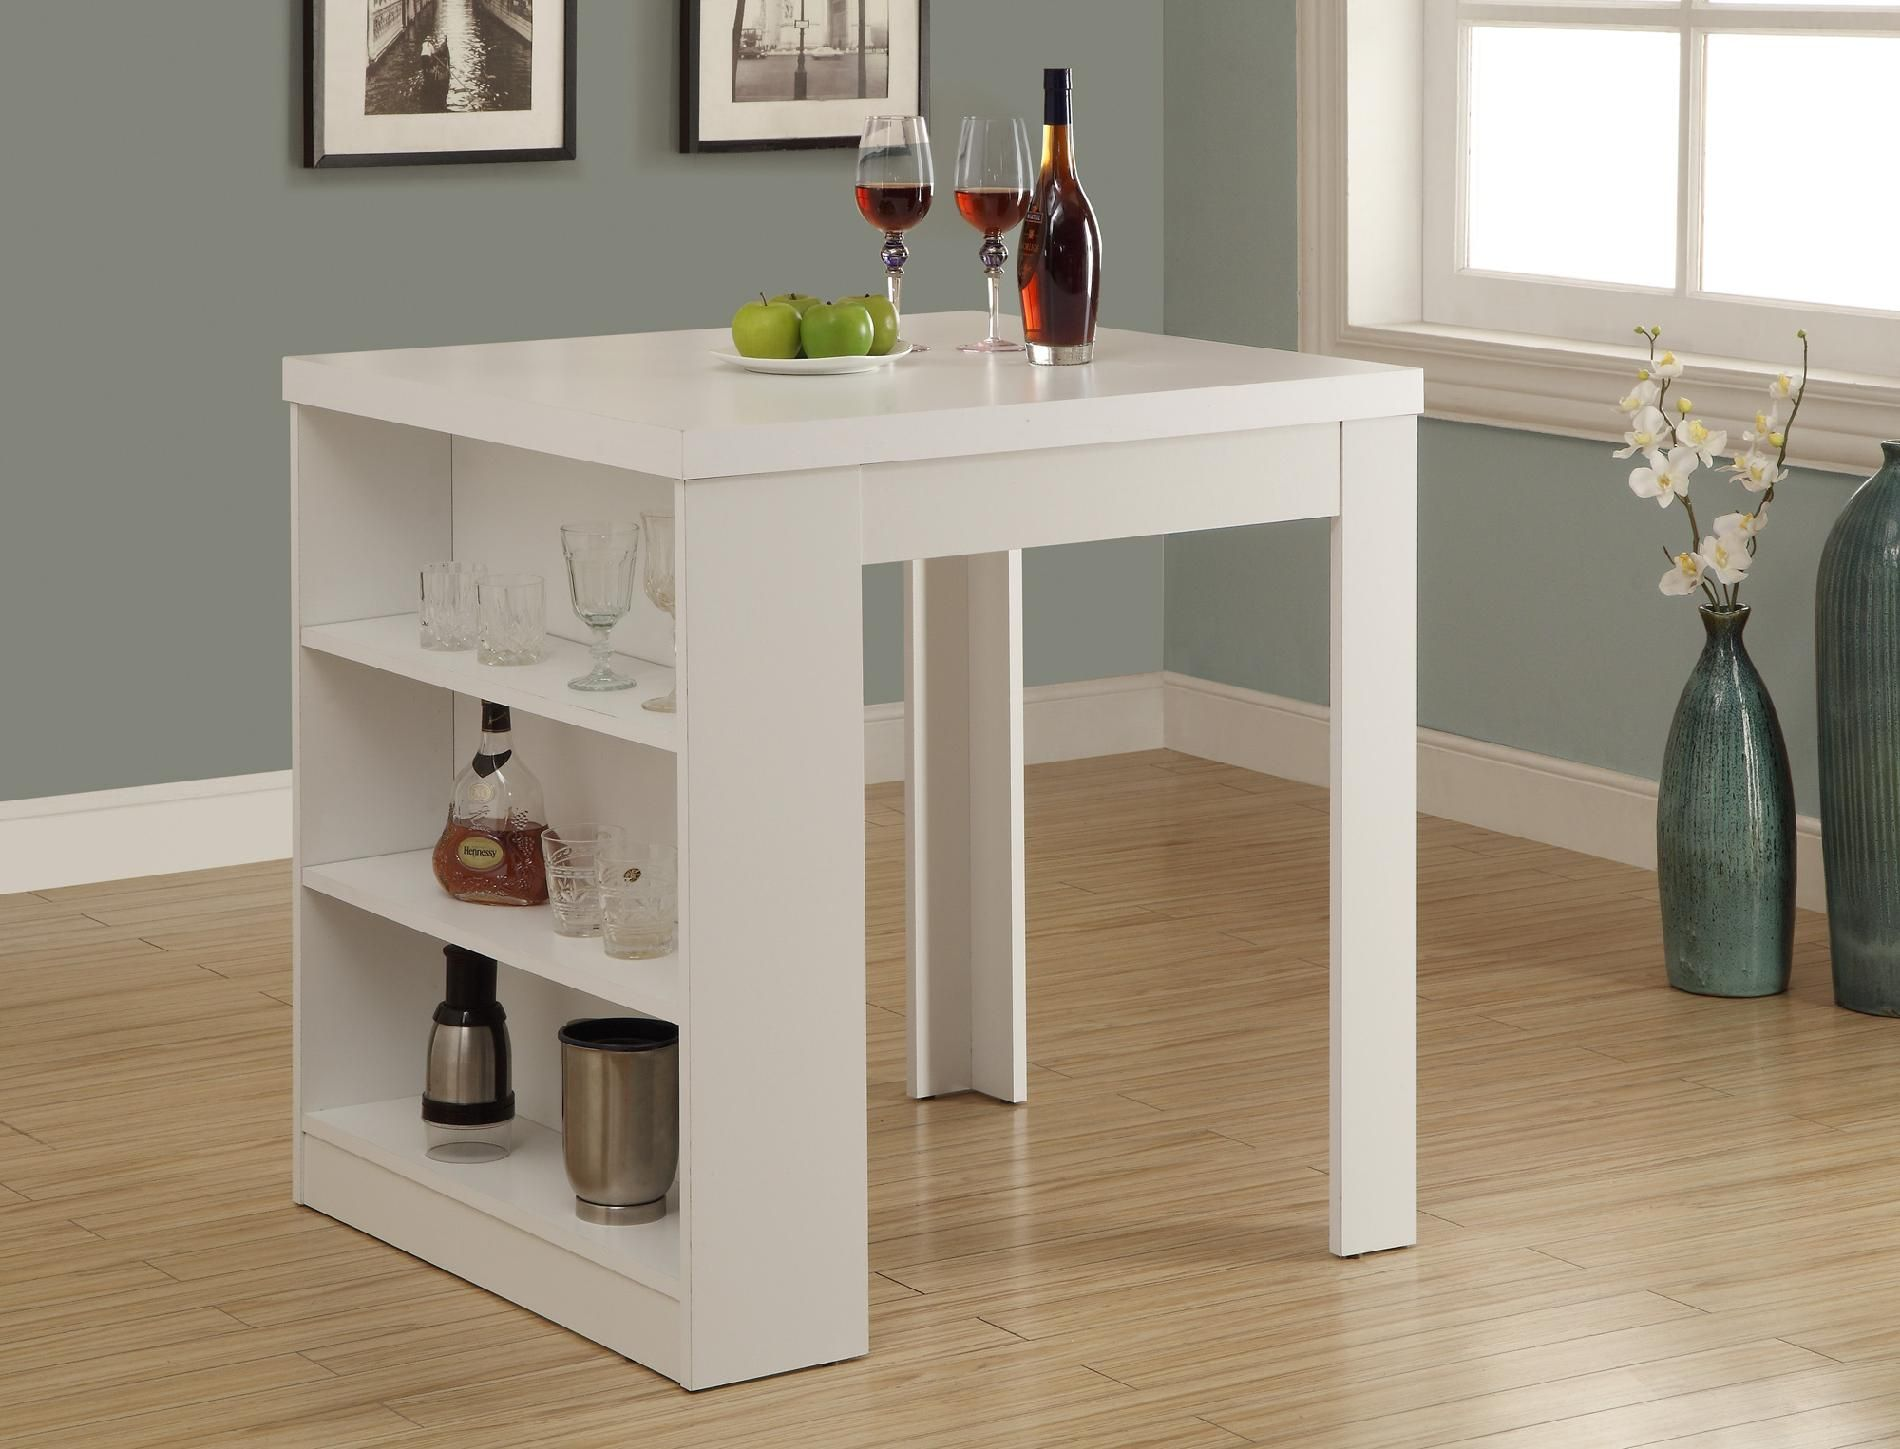 kitchen table storage black round set monarch specialties dining 32 x 36 white counter height